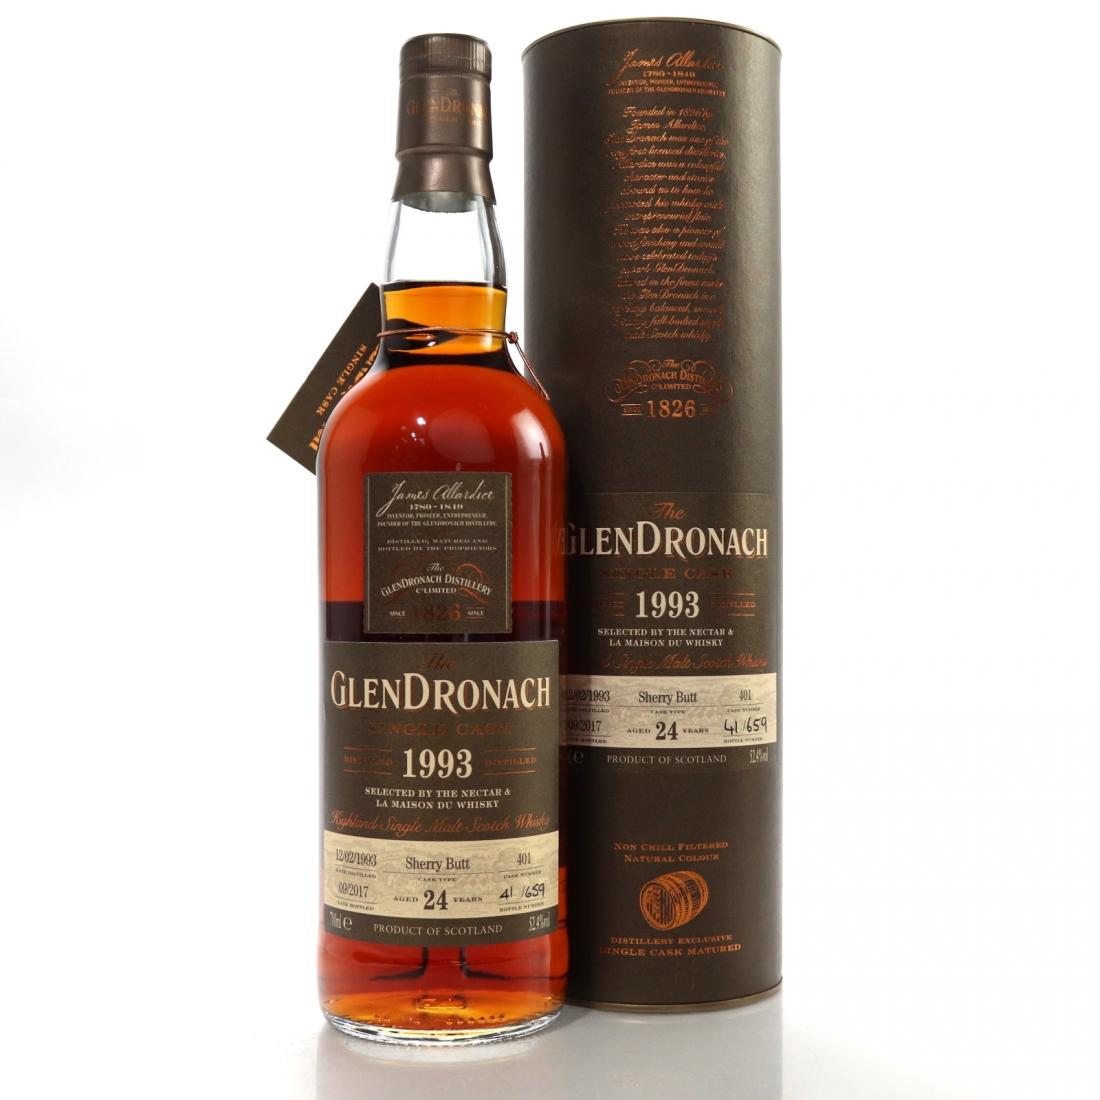 Glendronach 1993 Single Cask 24 Year Old #401 / The Nectar & LMDW